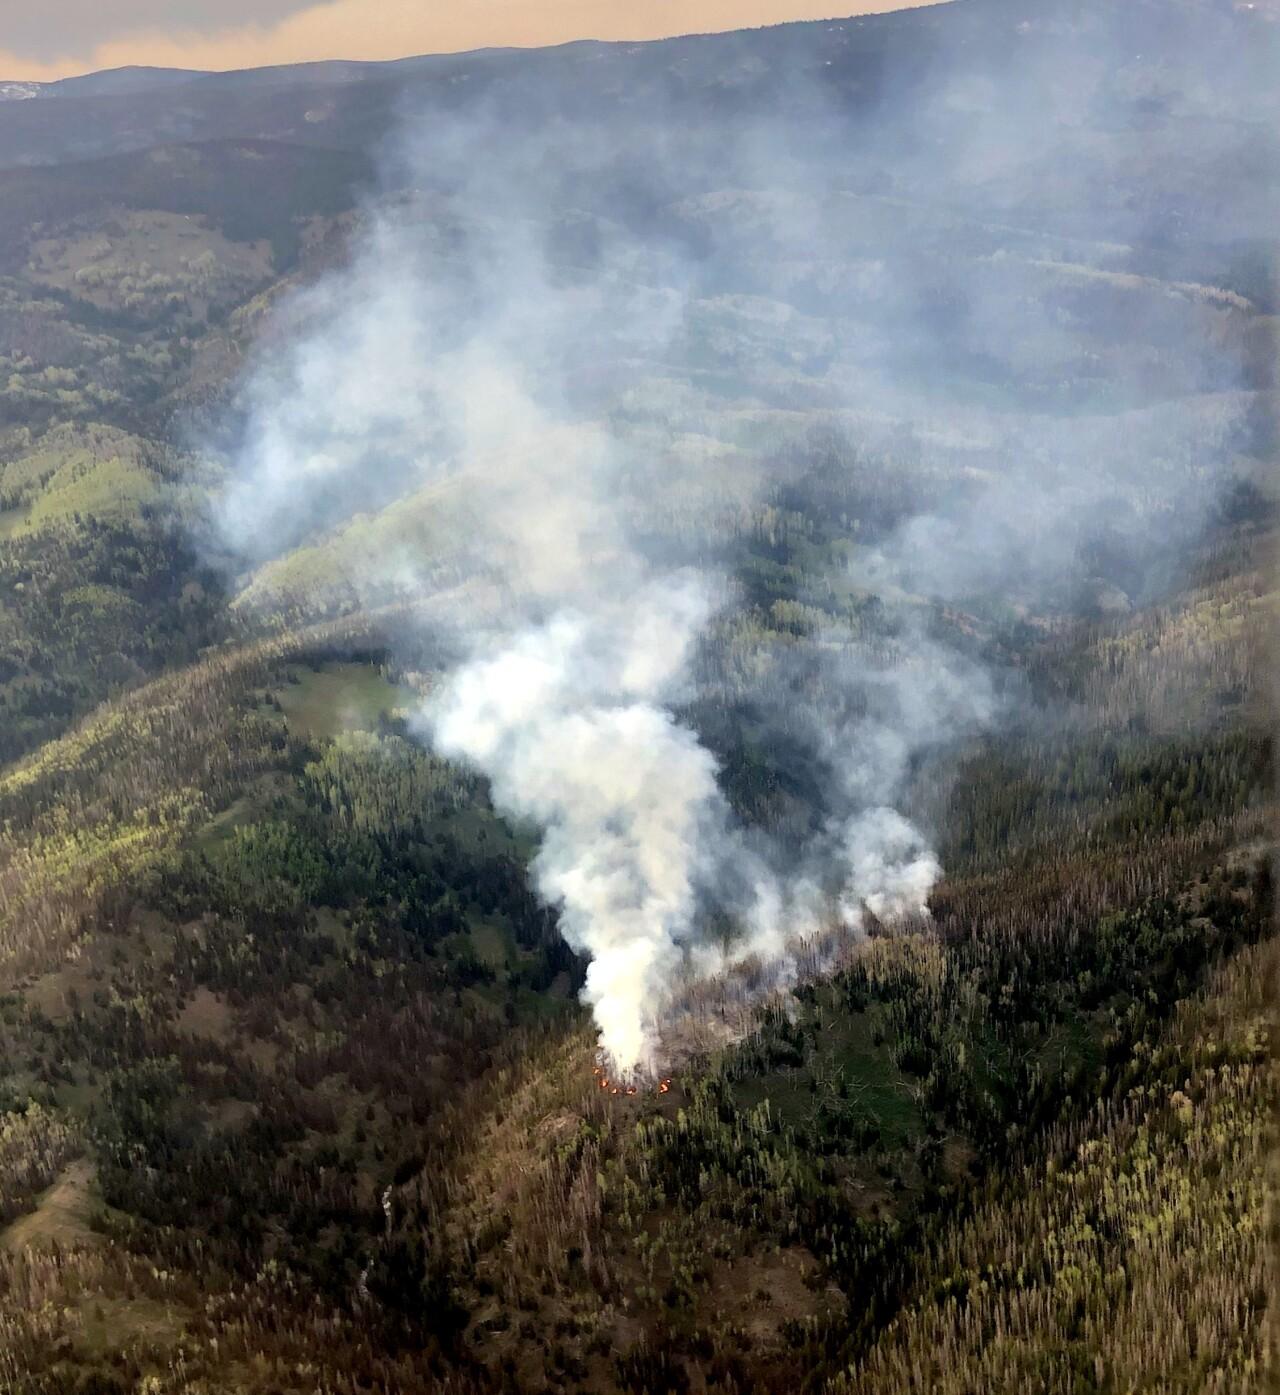 North Fork Fire in WY_June 7 2021_Casper Interagency Dispatch Center